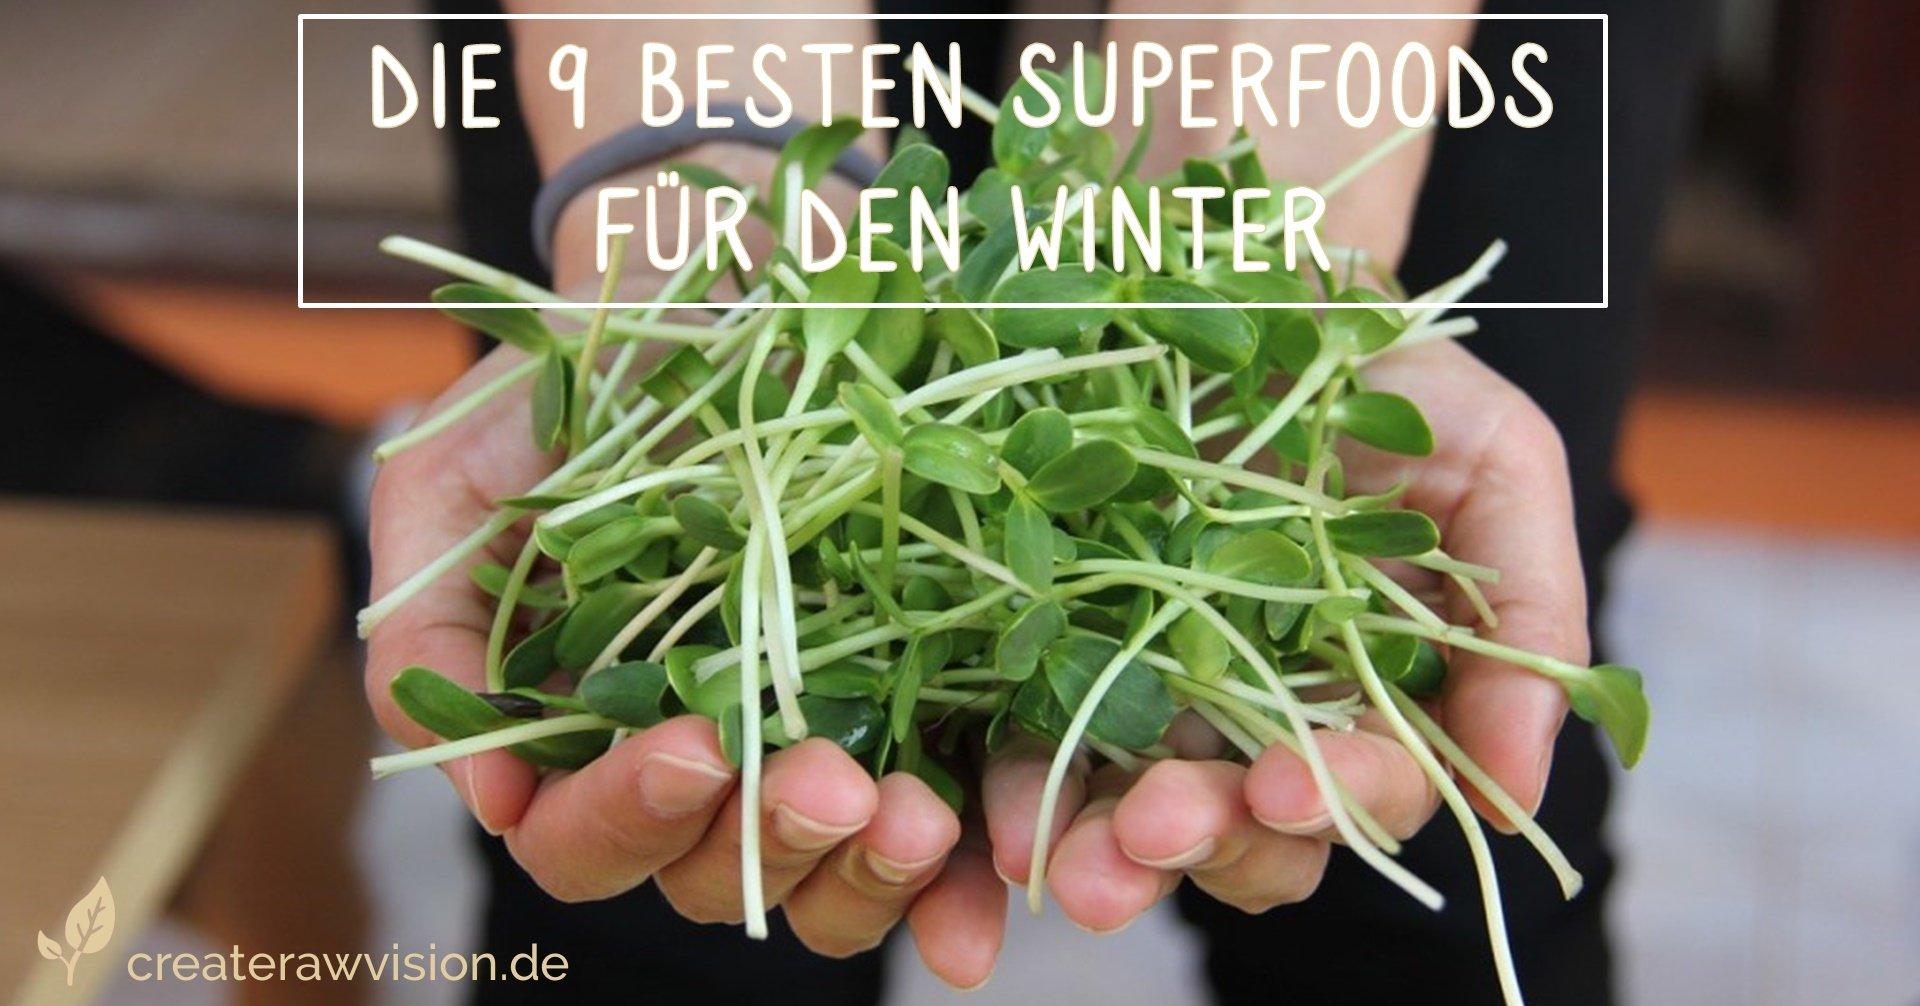 Sprossen - Superfoods